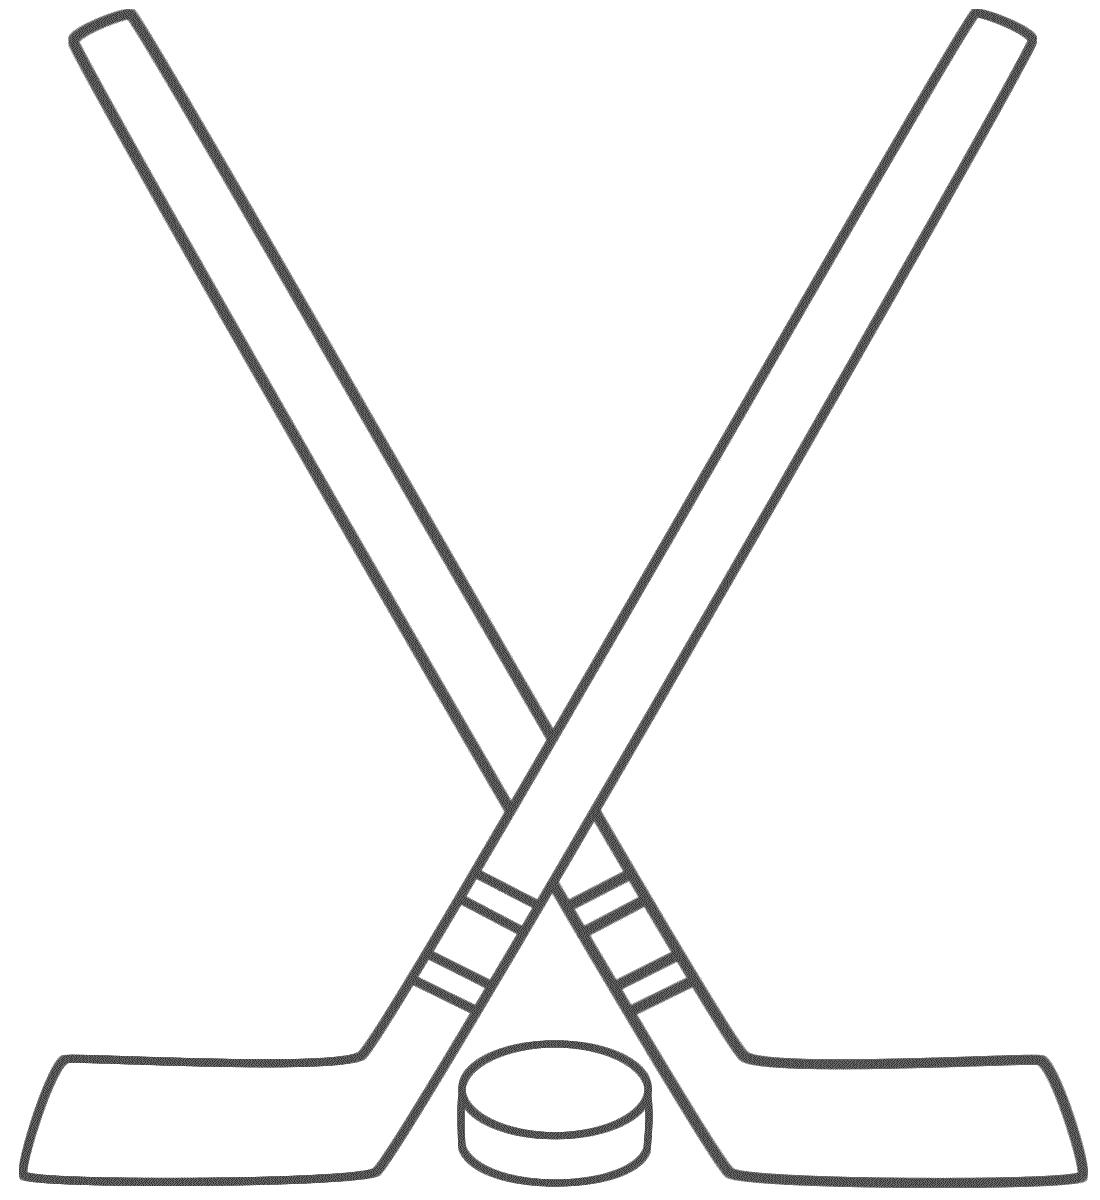 hight resolution of free hockey stick clipart